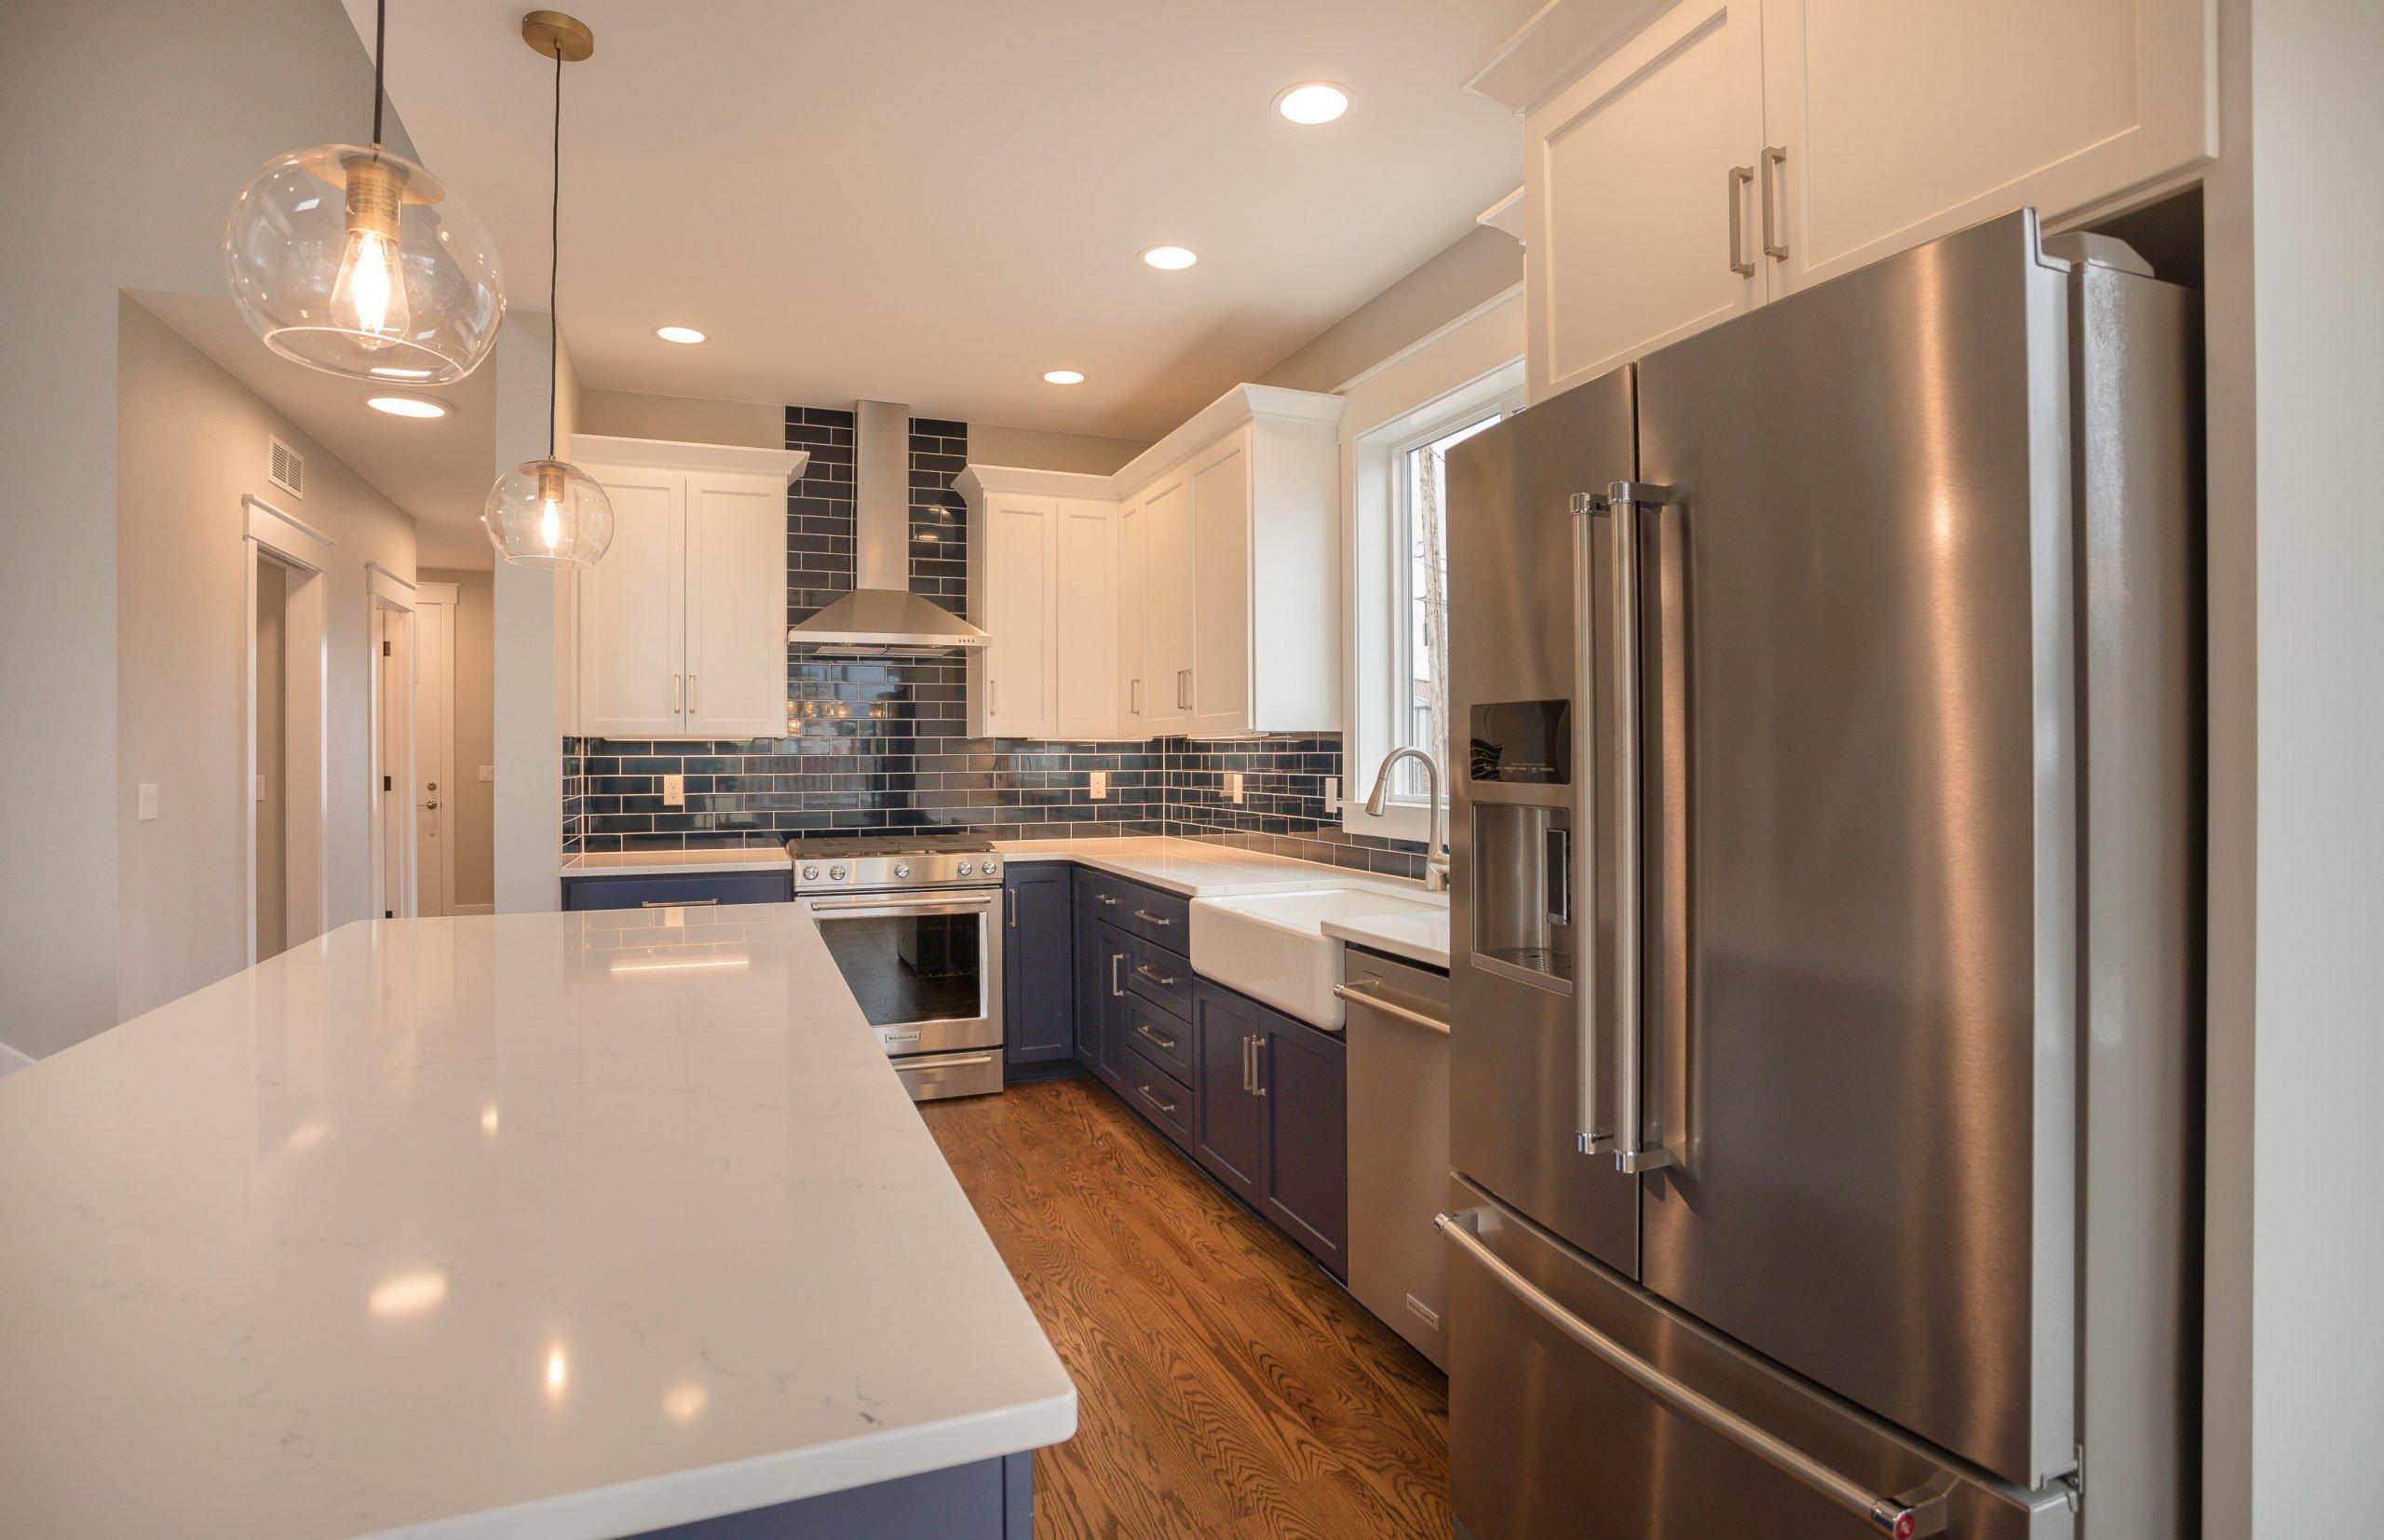 10 kitchen scaled